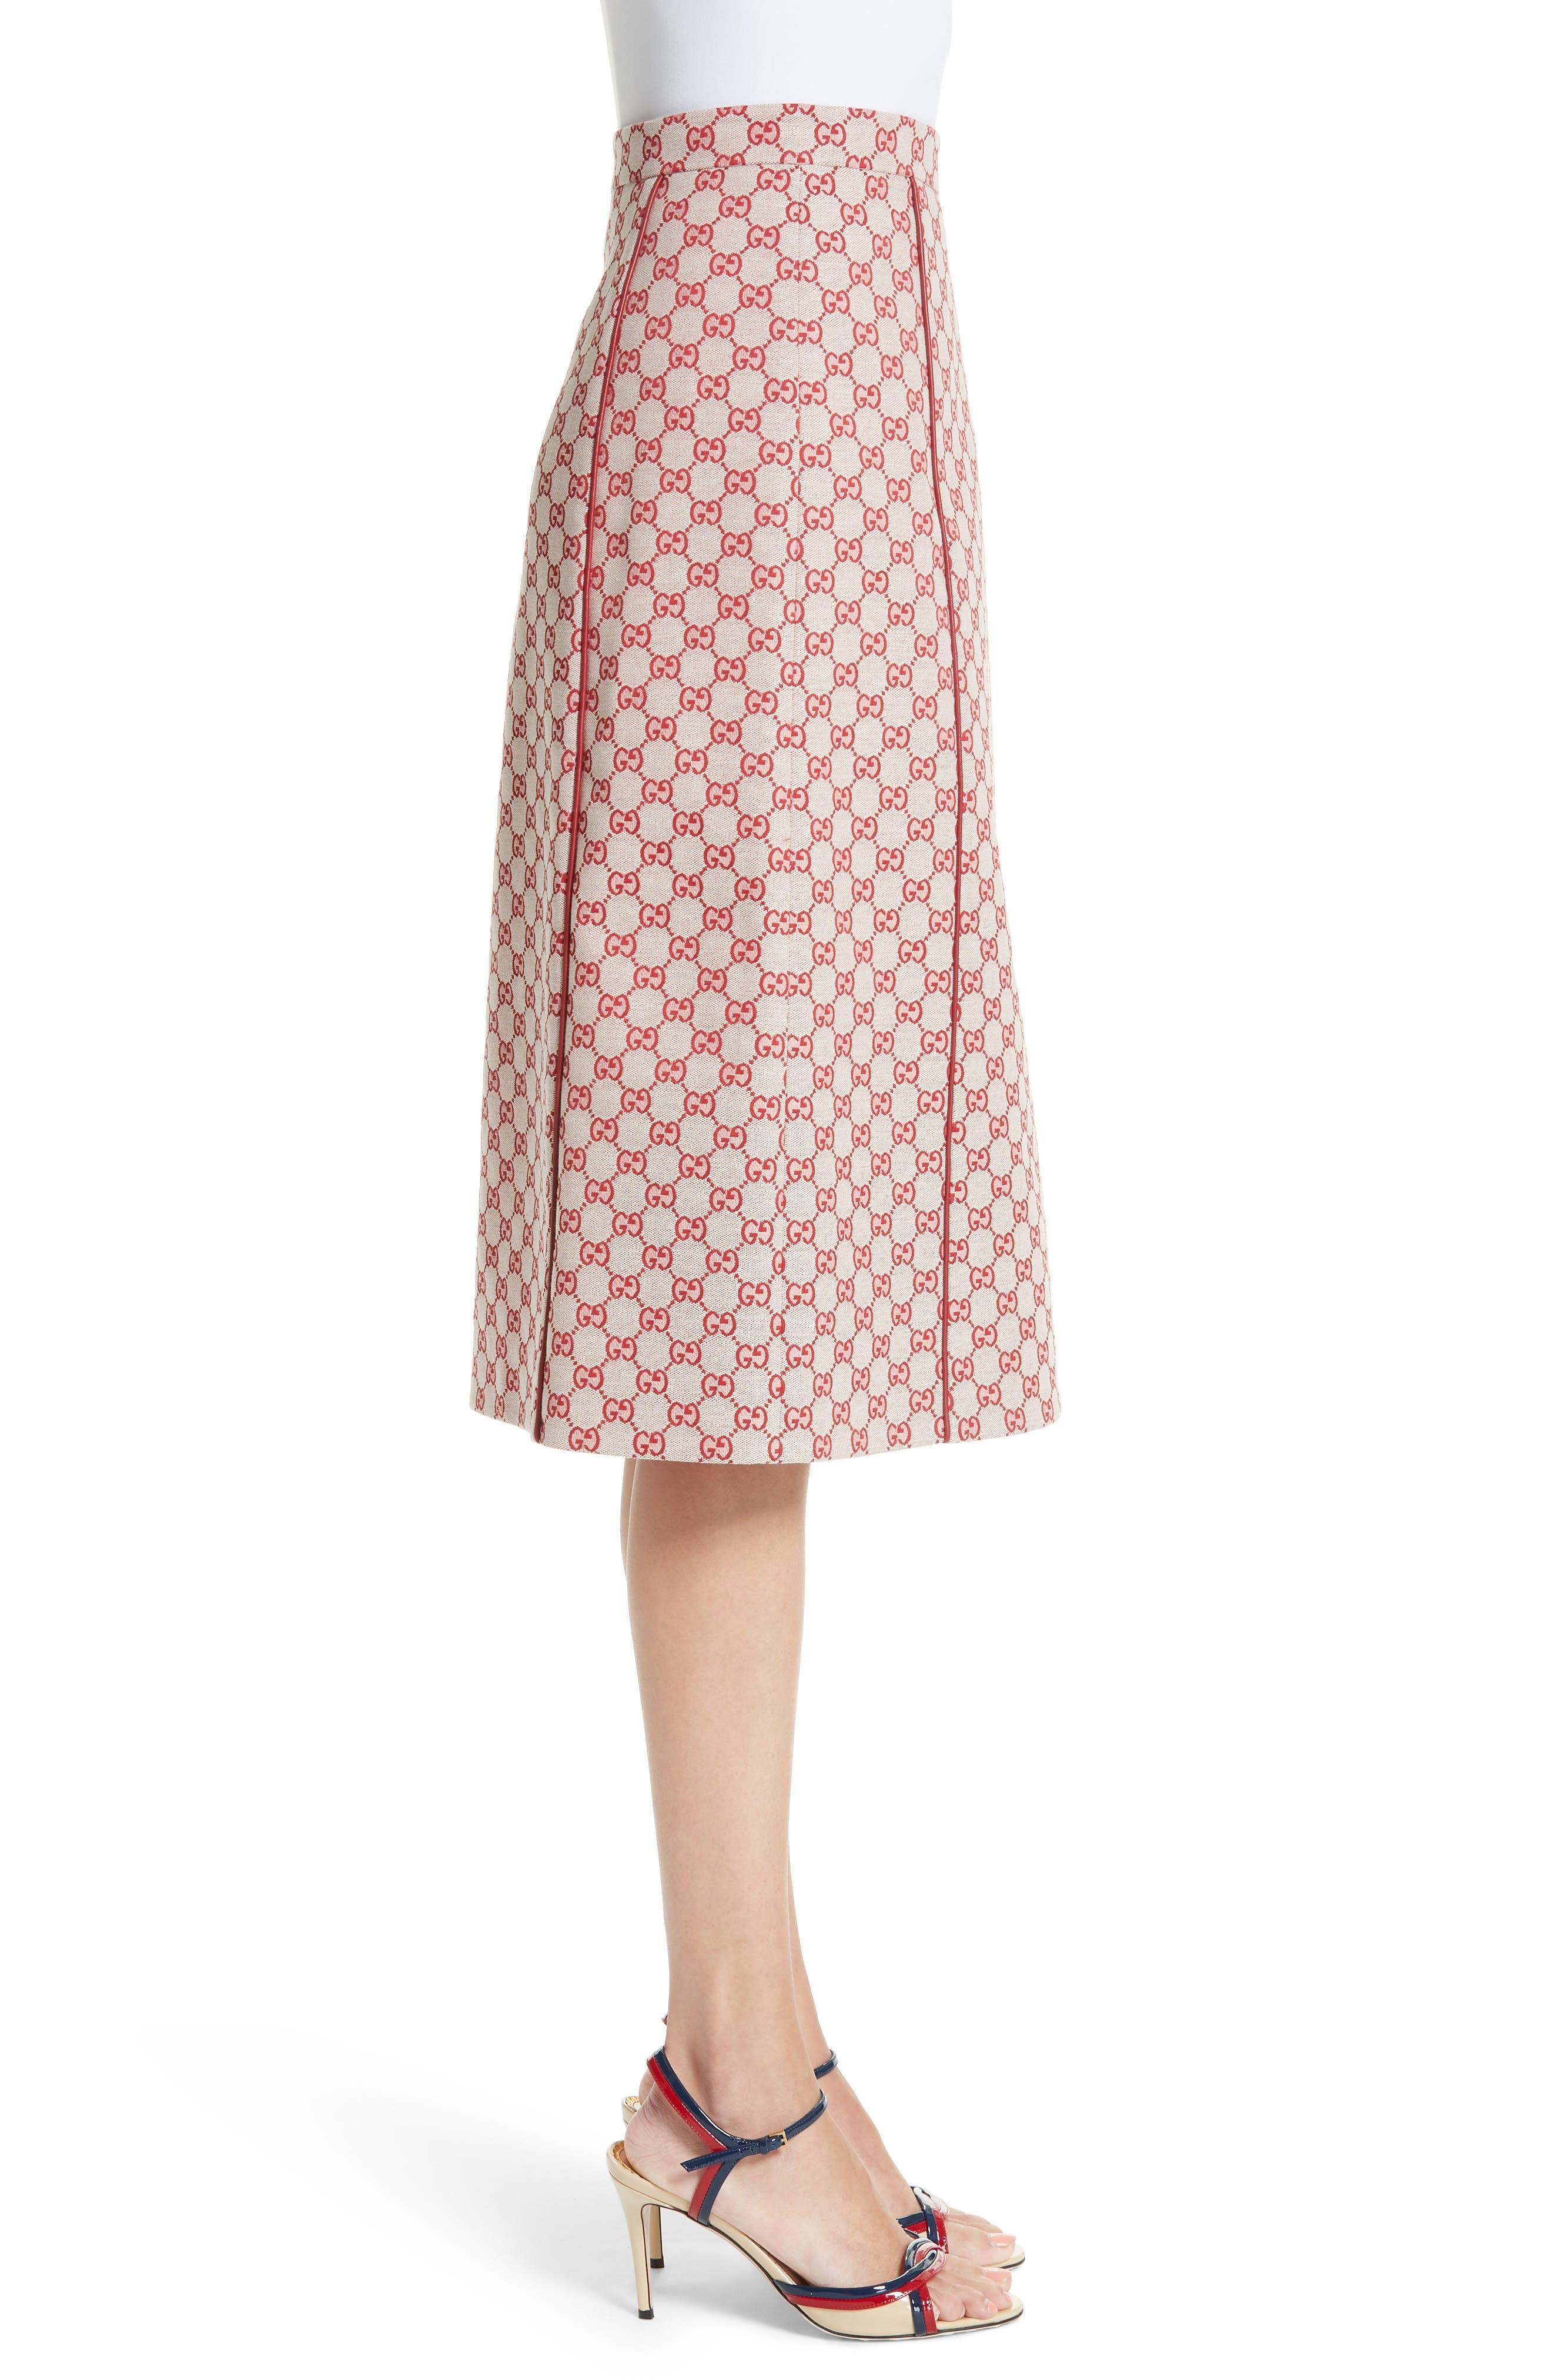 GG Print Canvas A-Line Skirt,                             Alternate thumbnail 3, color,                             GARDENIA/ HIBISCUS RED